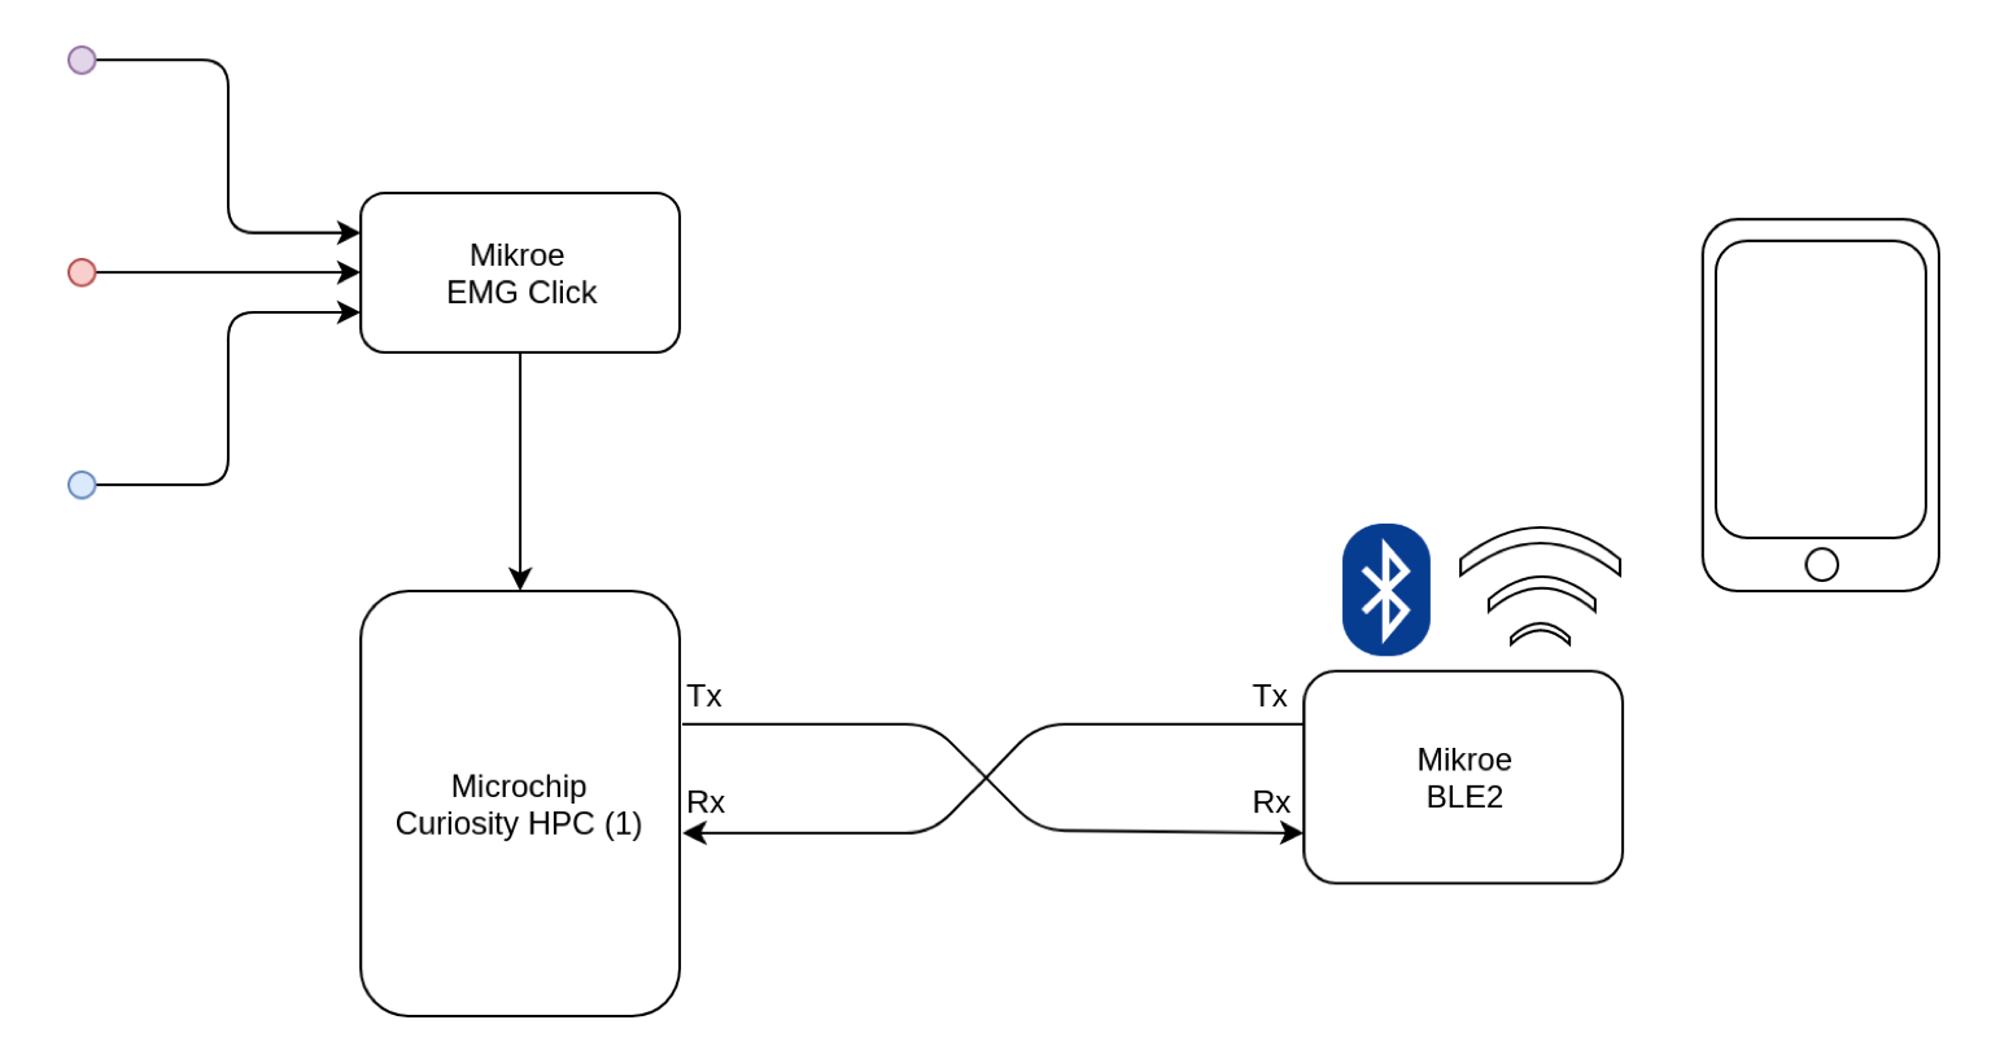 Emg Select Wiring Diagram Get Free Image About Wiring Diagram